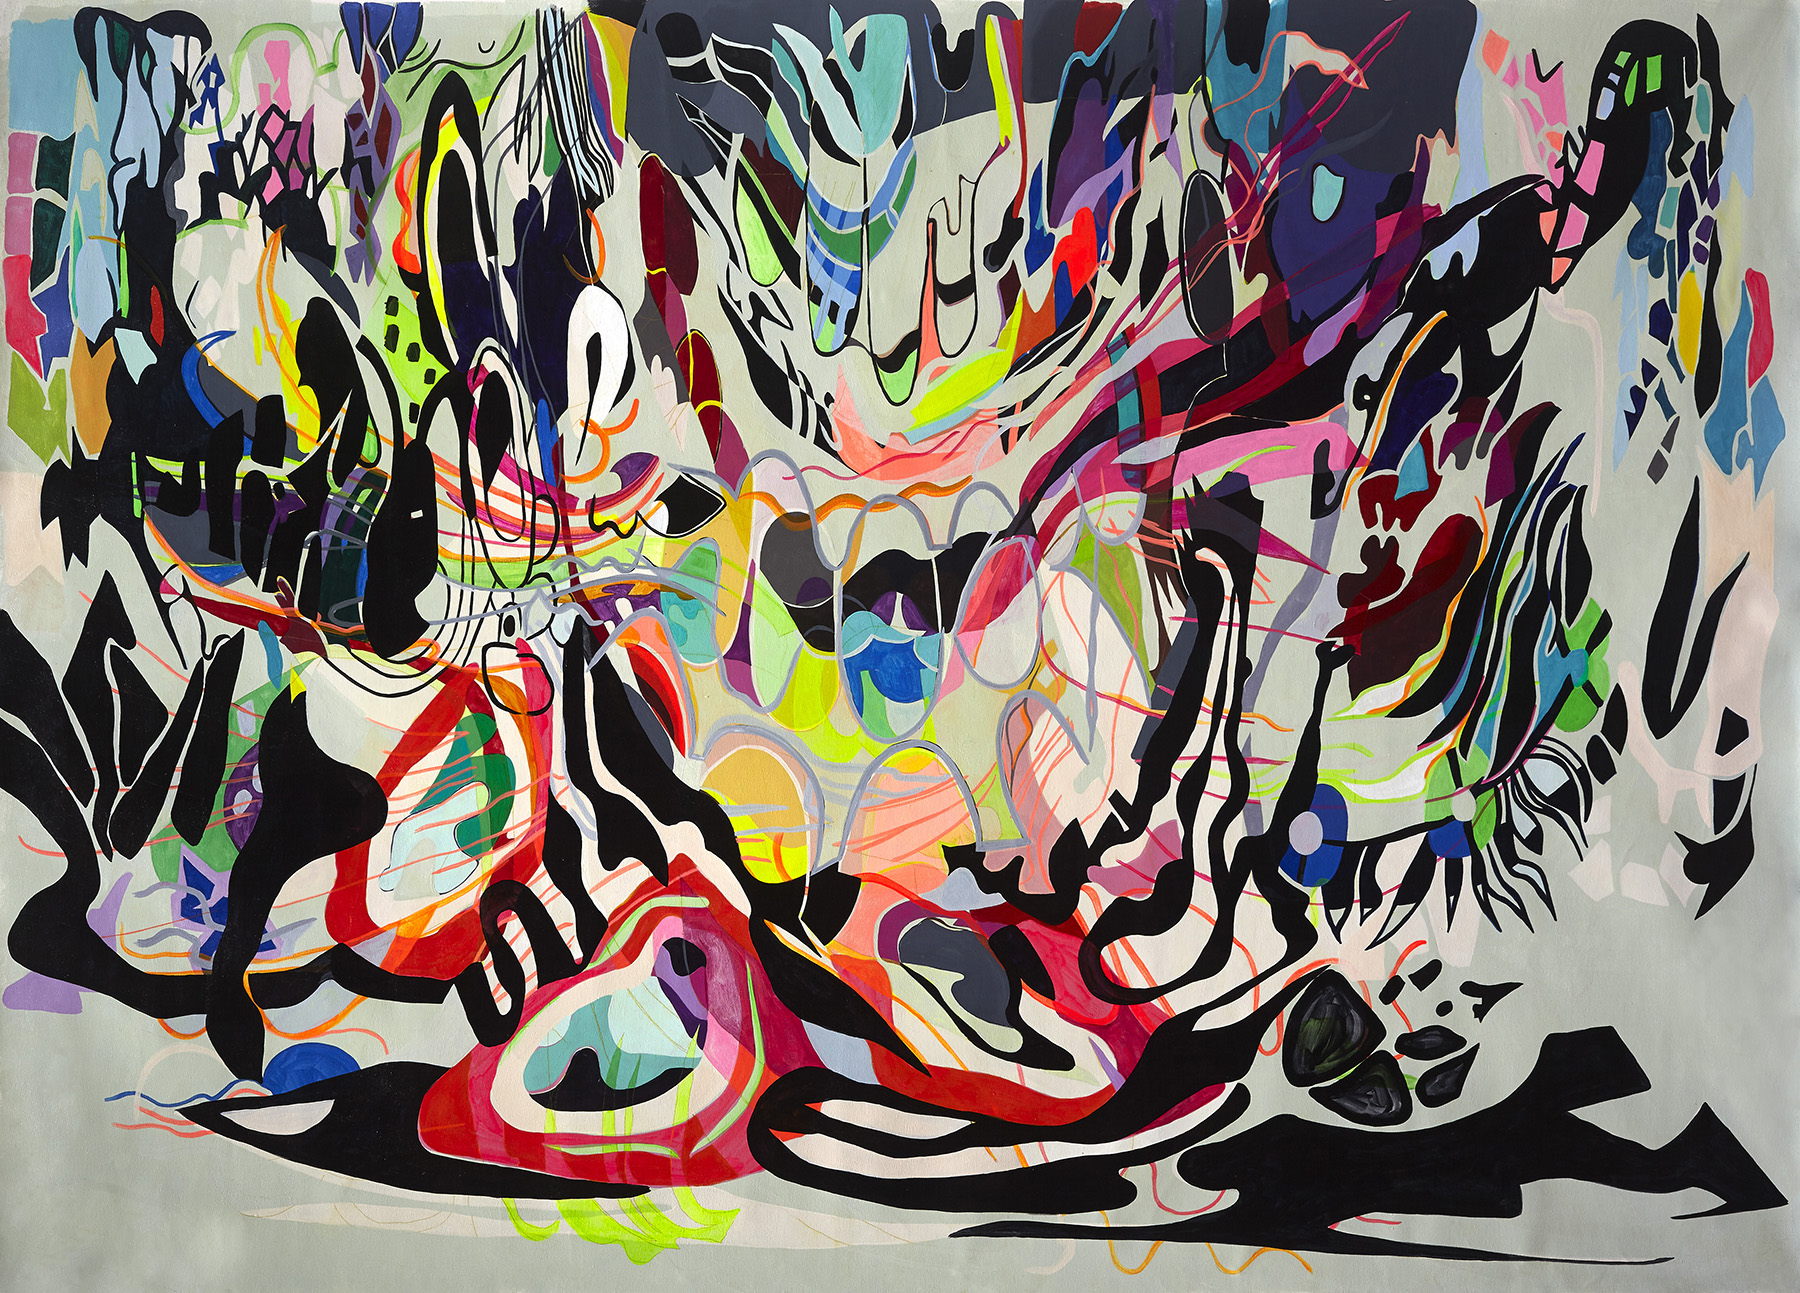 'Punto de inflexion (Point of inflection)' Paula Nahmod Acrylic and flashe vinyl on canvas, 180 x 130 cm, 2016